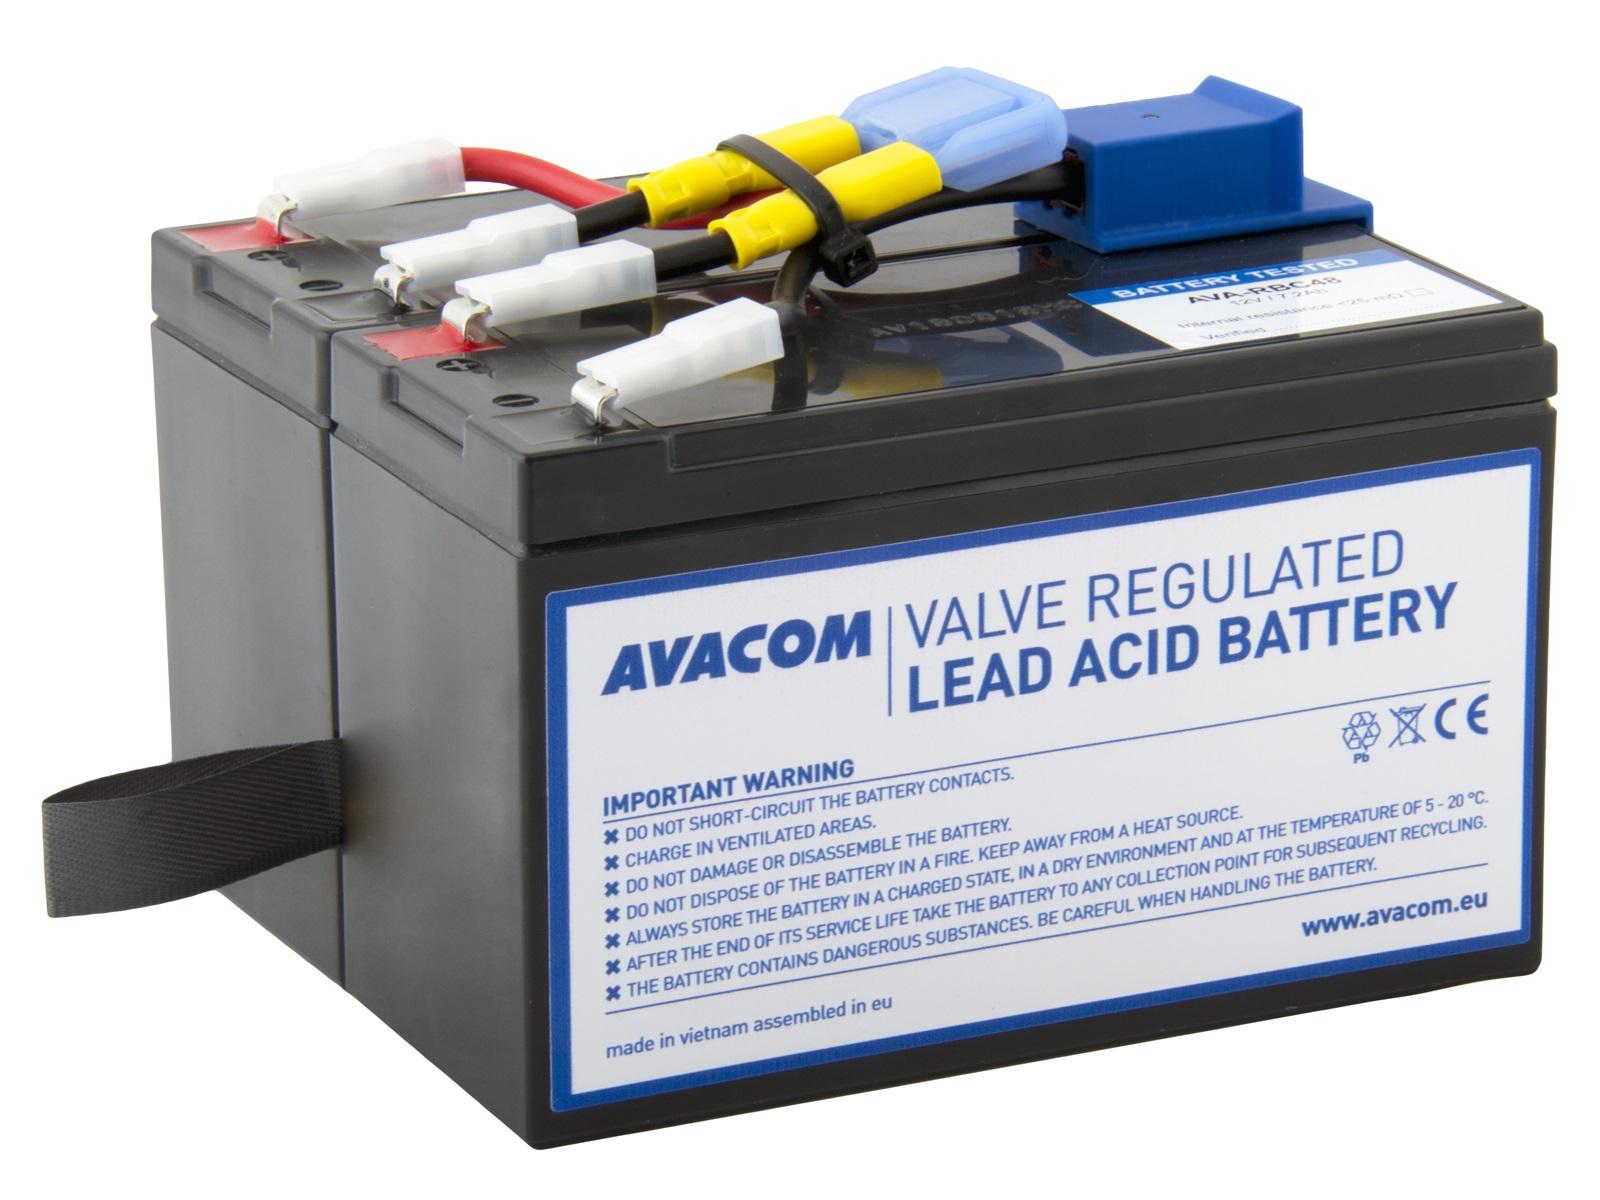 Baterie AVACOM AVA-RBC48 náhrada za RBC48 - baterie pro UPS - AVA-RBC48